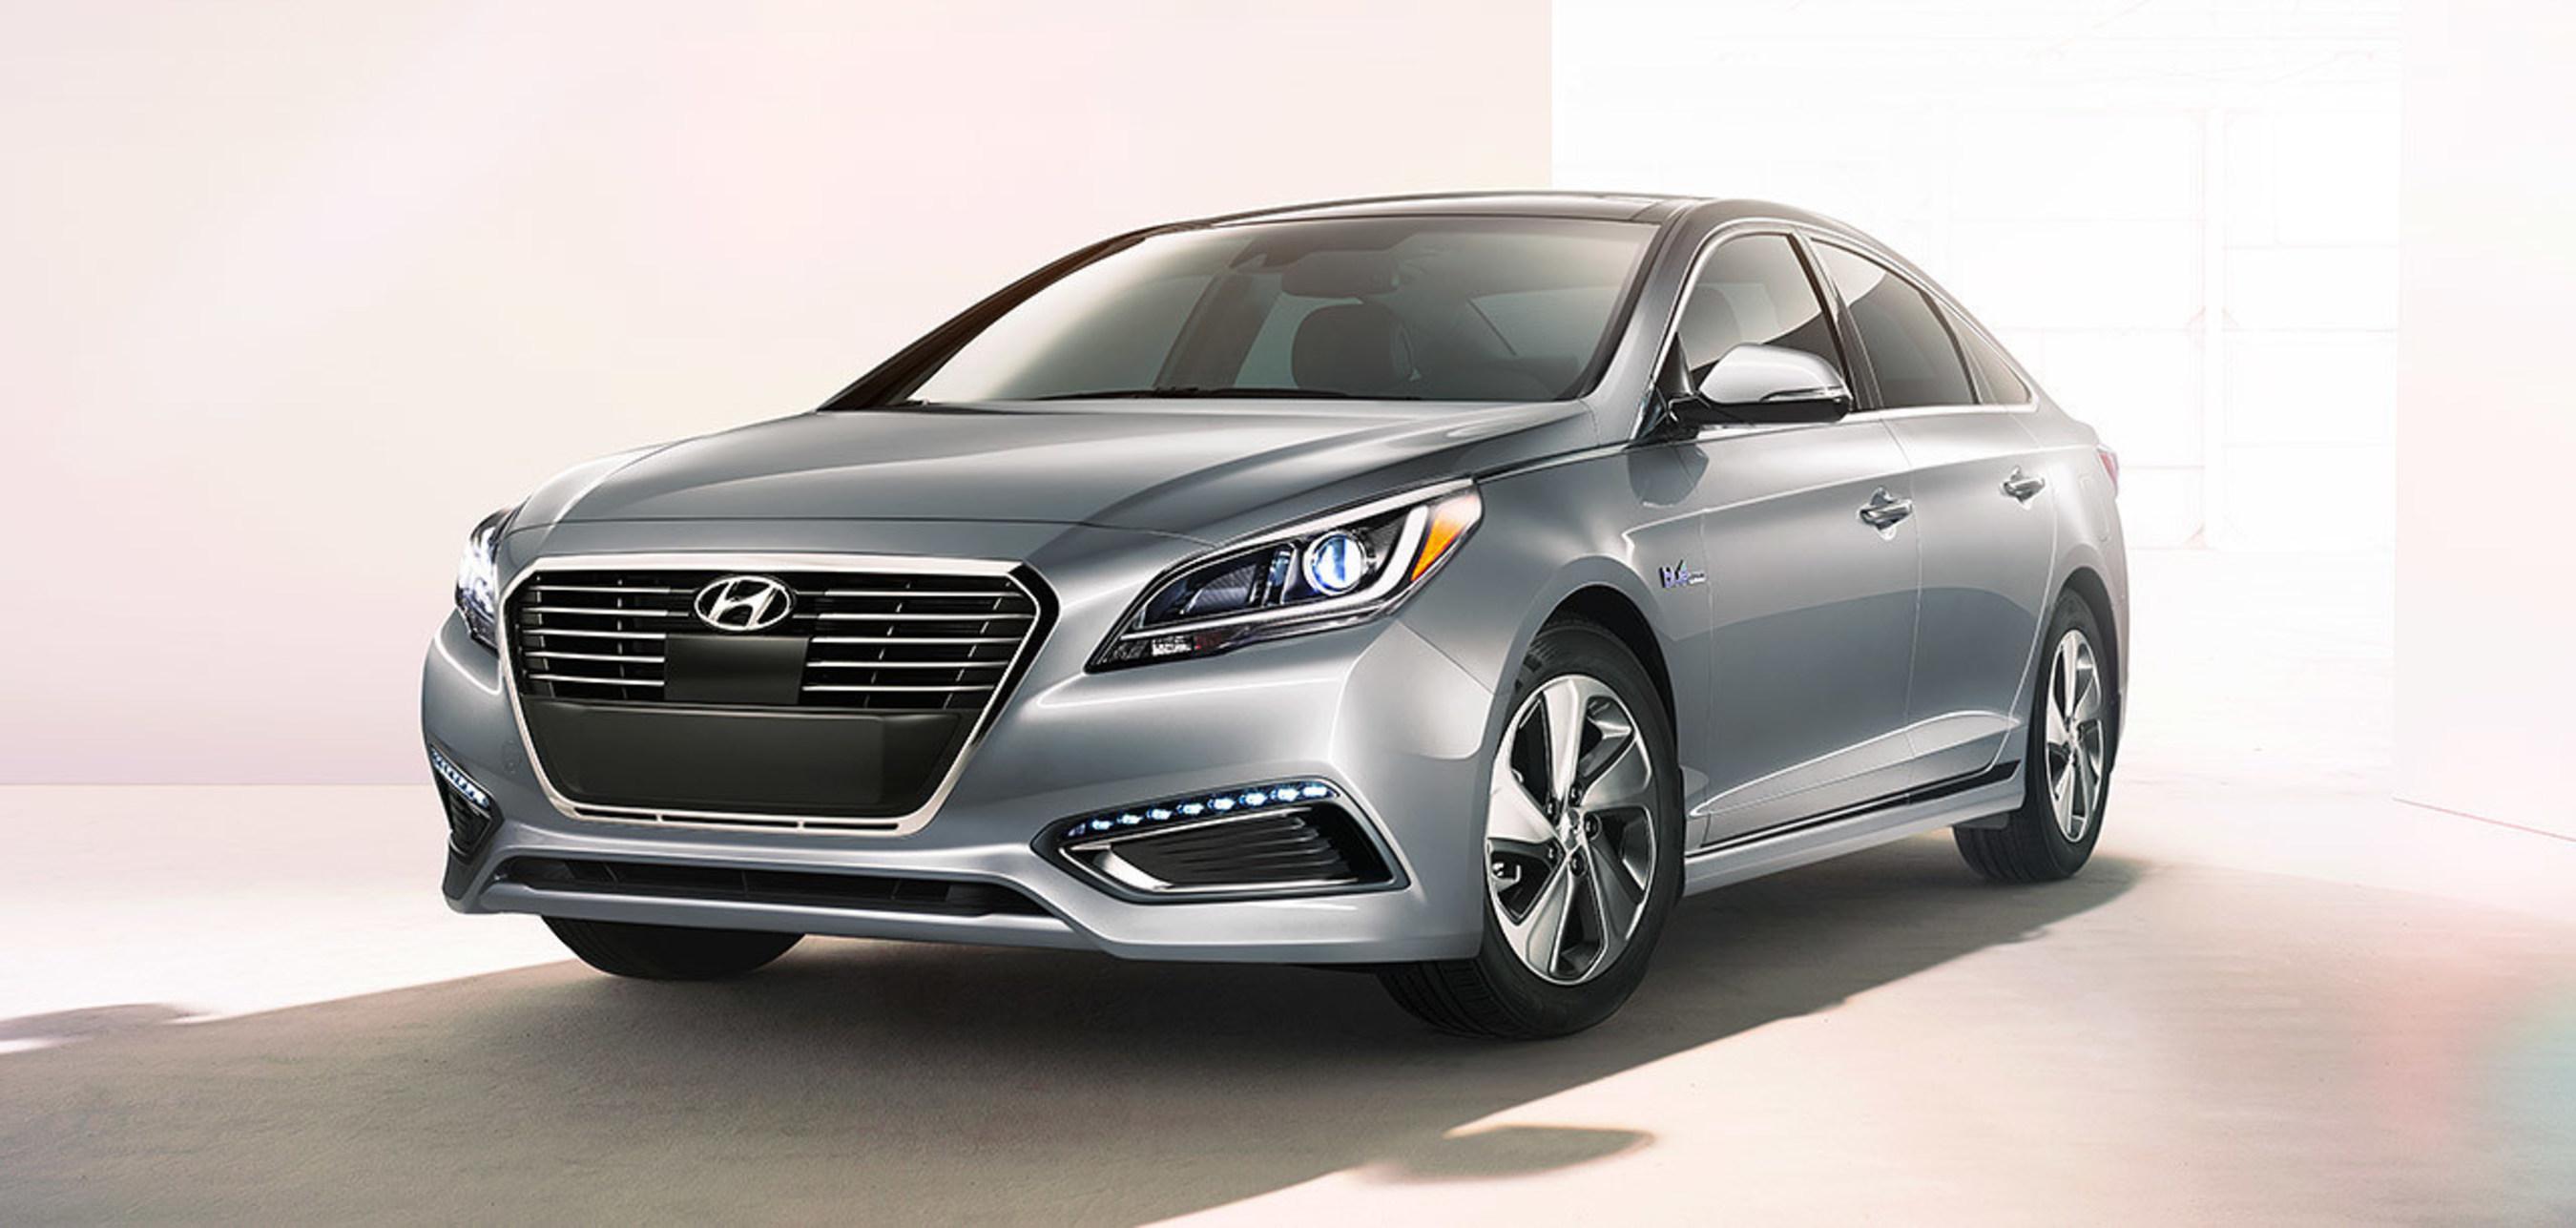 2016 Hyundai Sonata Hybrid Delivers Increased Fuel Economy Sophisticated Design